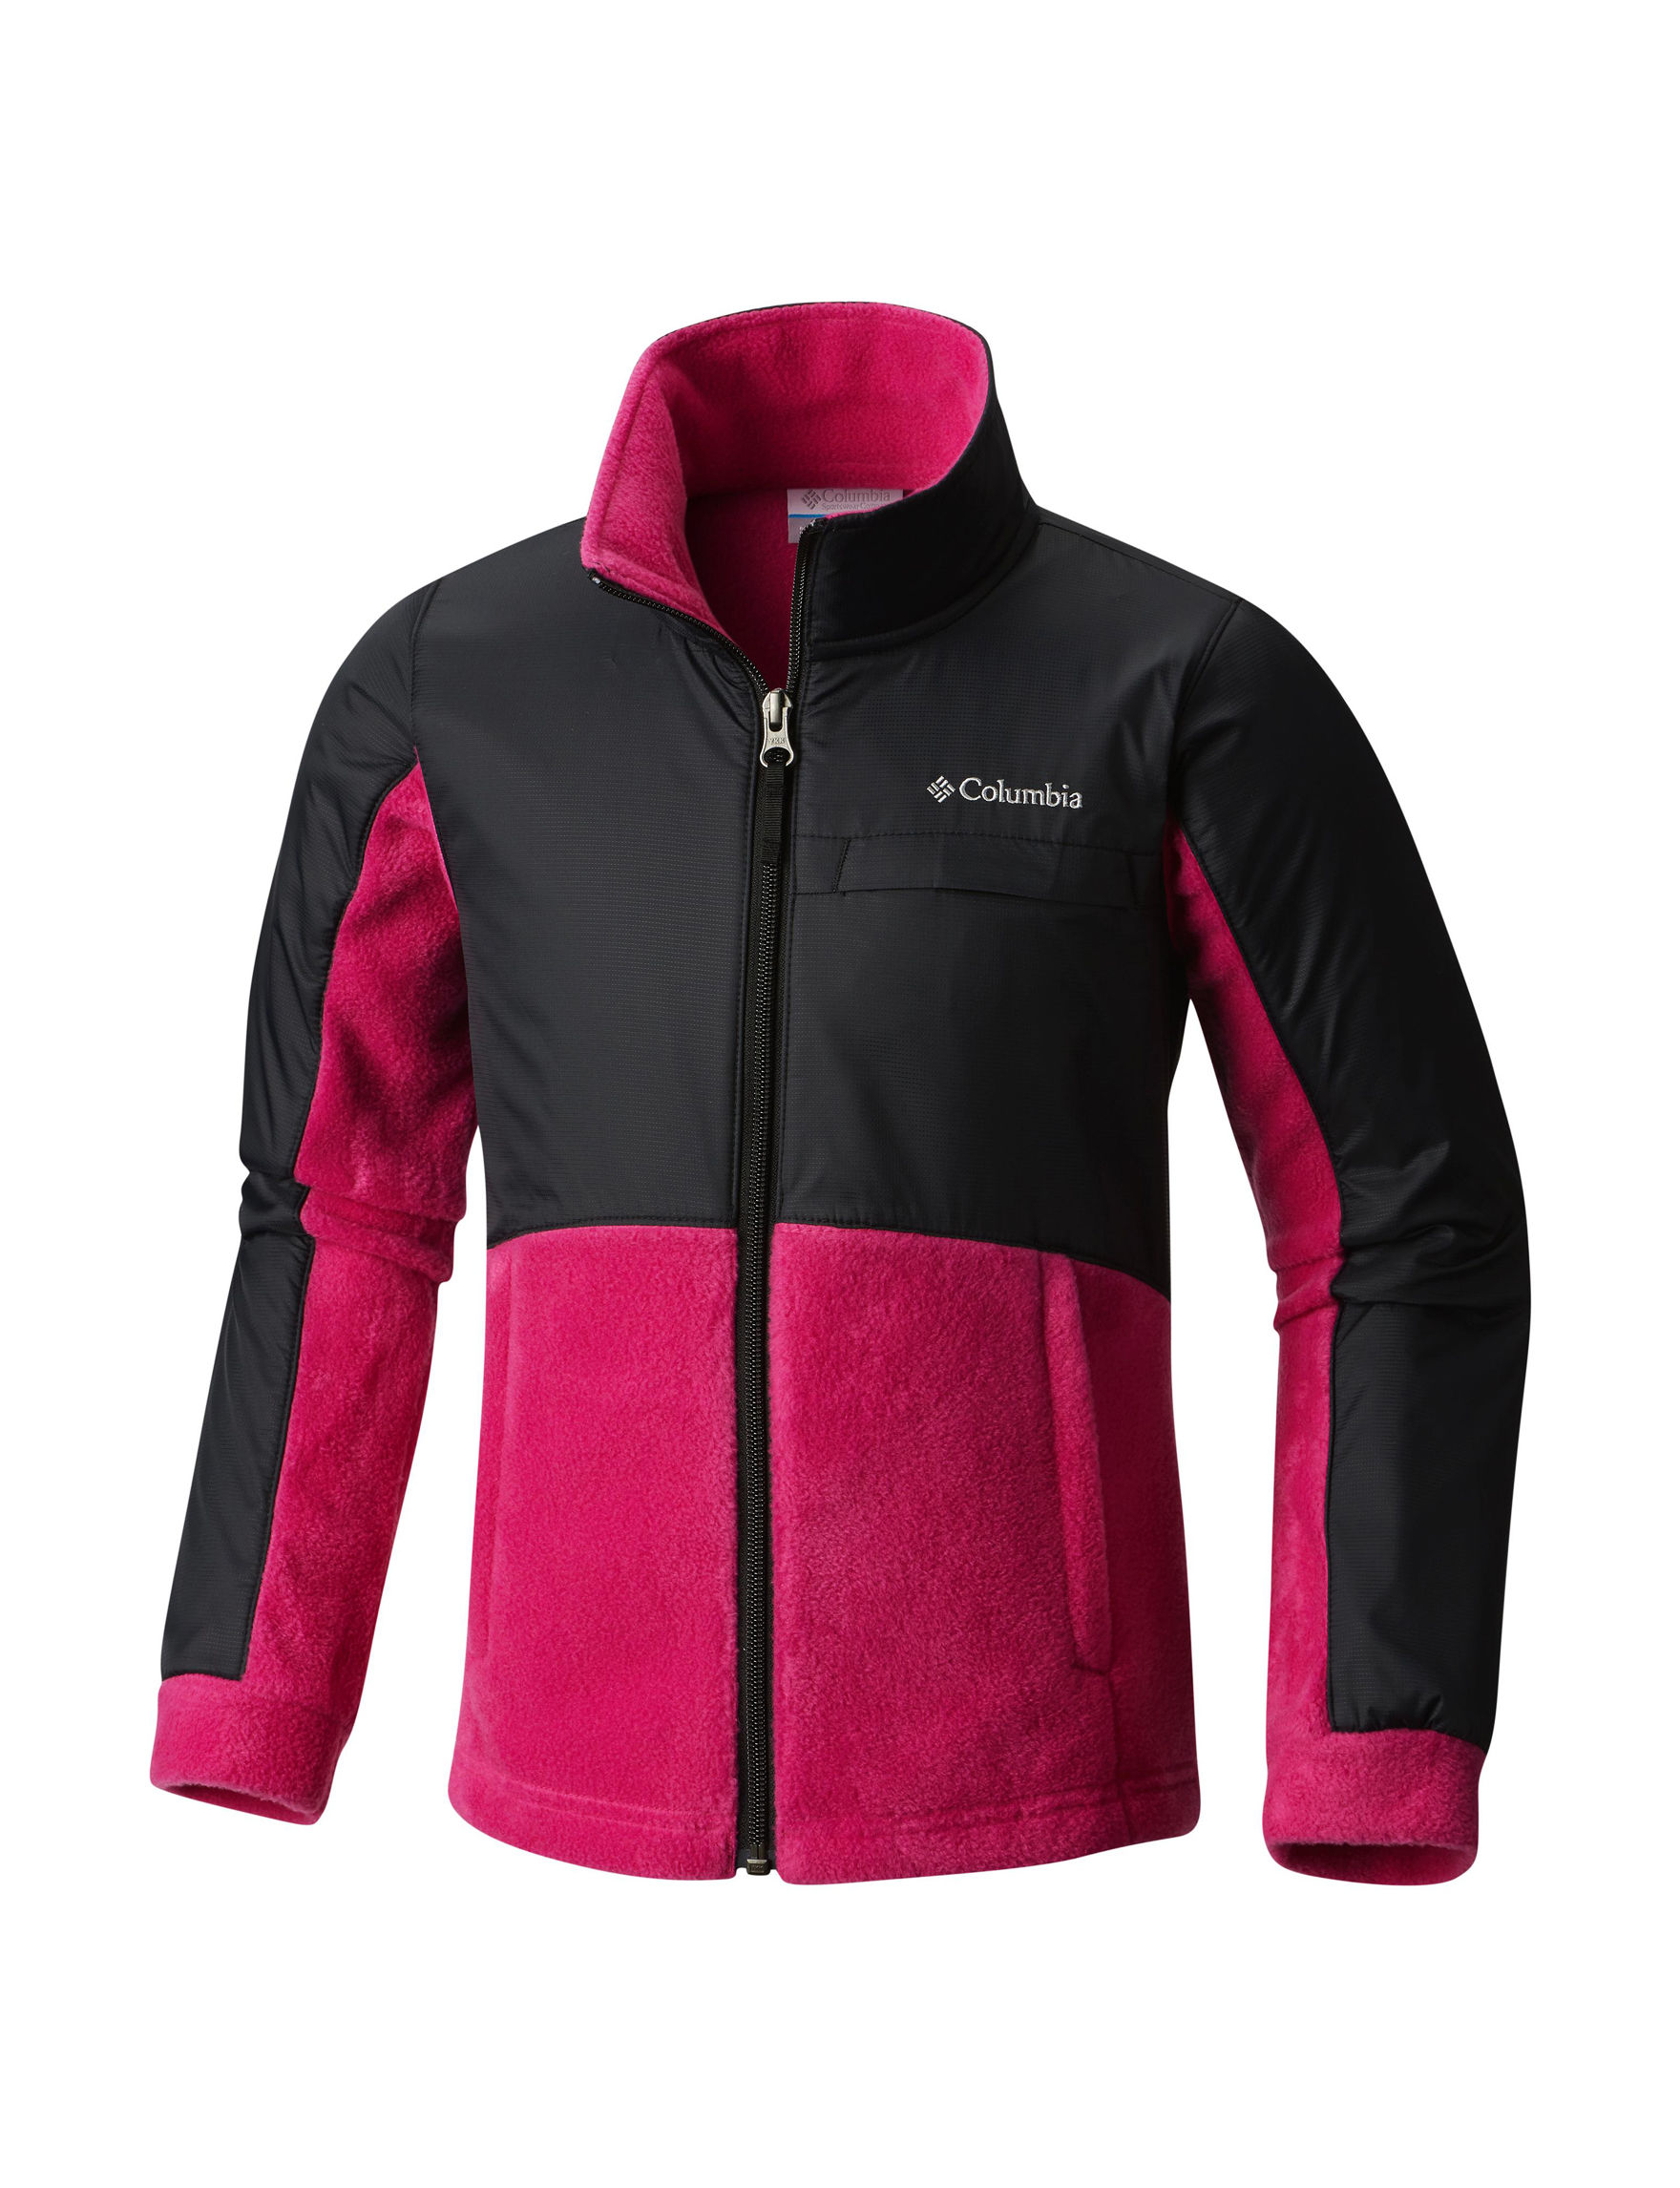 Columbia Black / Pink Fleece & Soft Shell Jackets